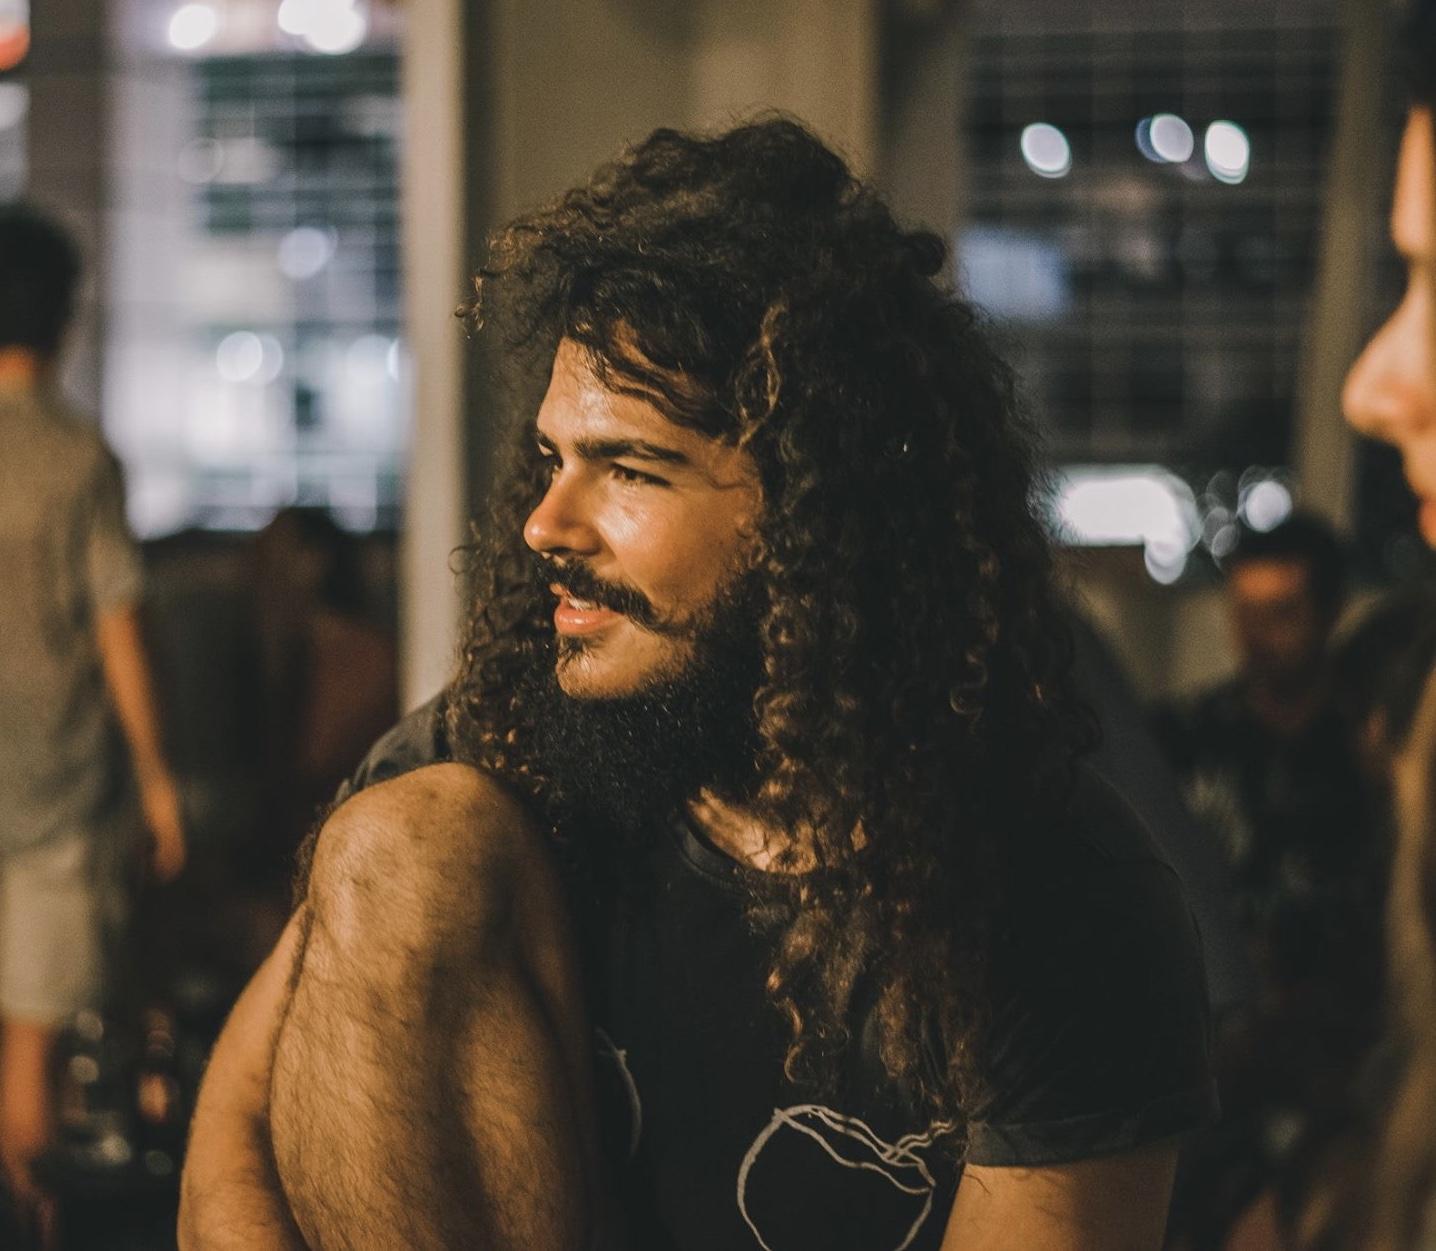 Jose Manuel's profile picture